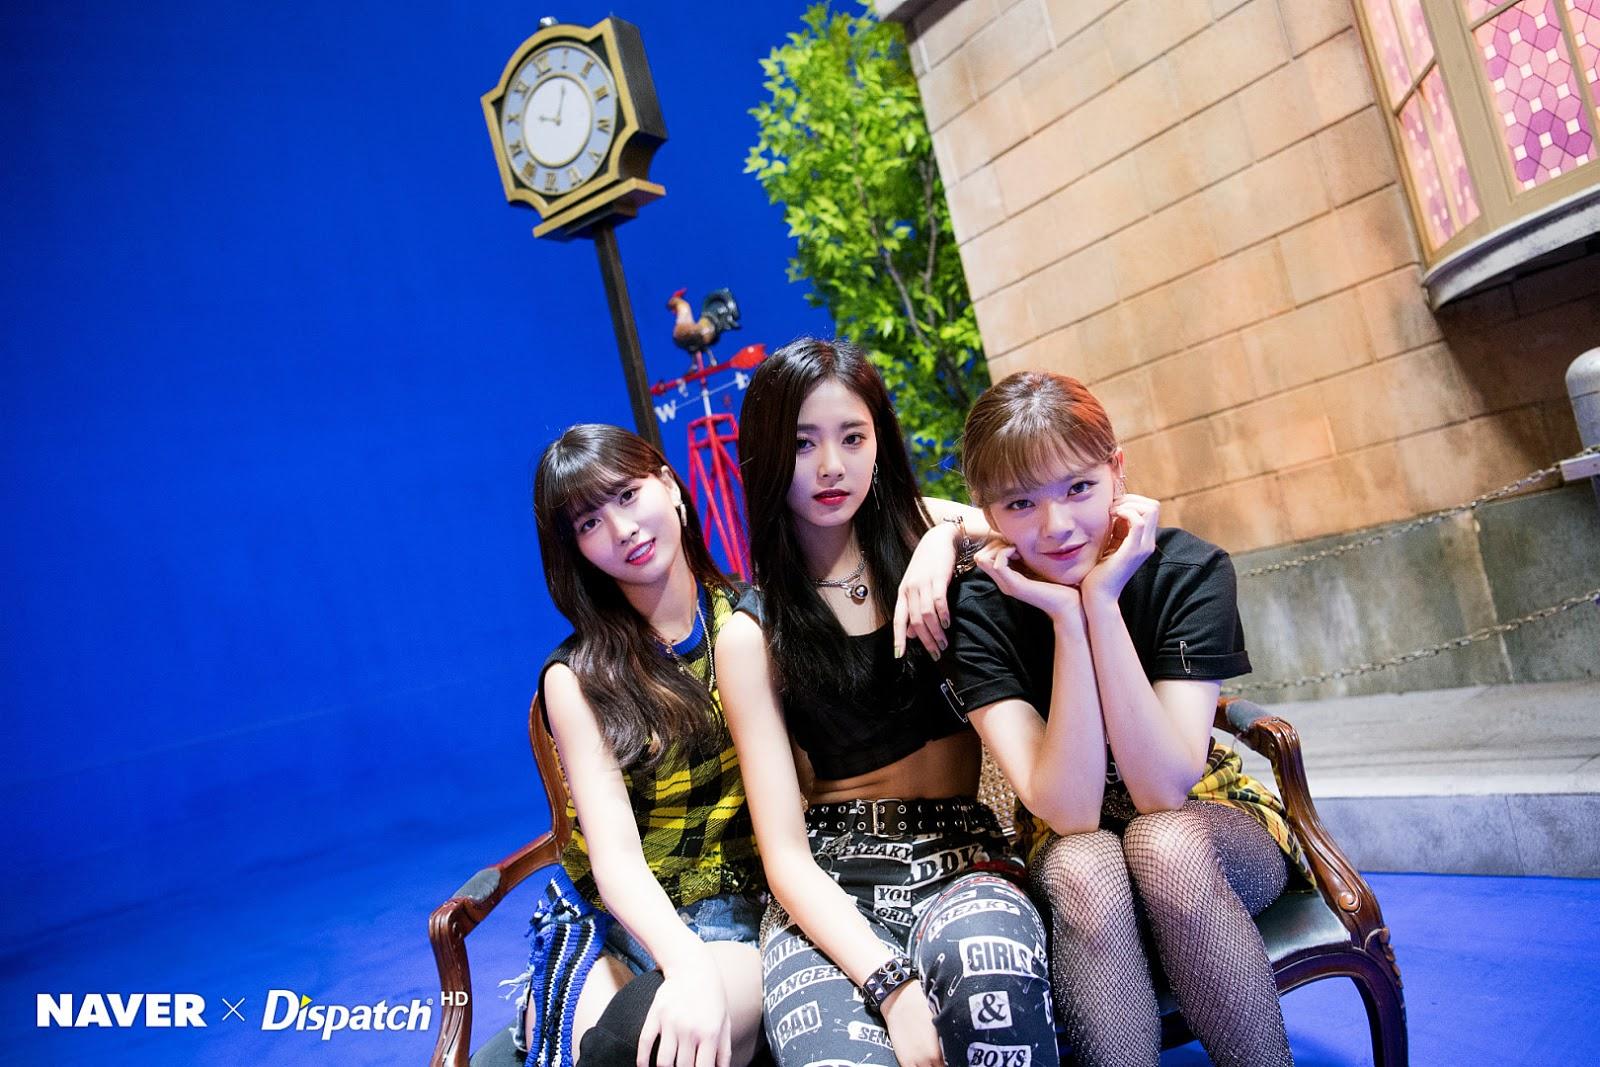 TWICE 'Yes hoặc Yes' MV Shooting - Jeongyeon, Momo, Tzuyu